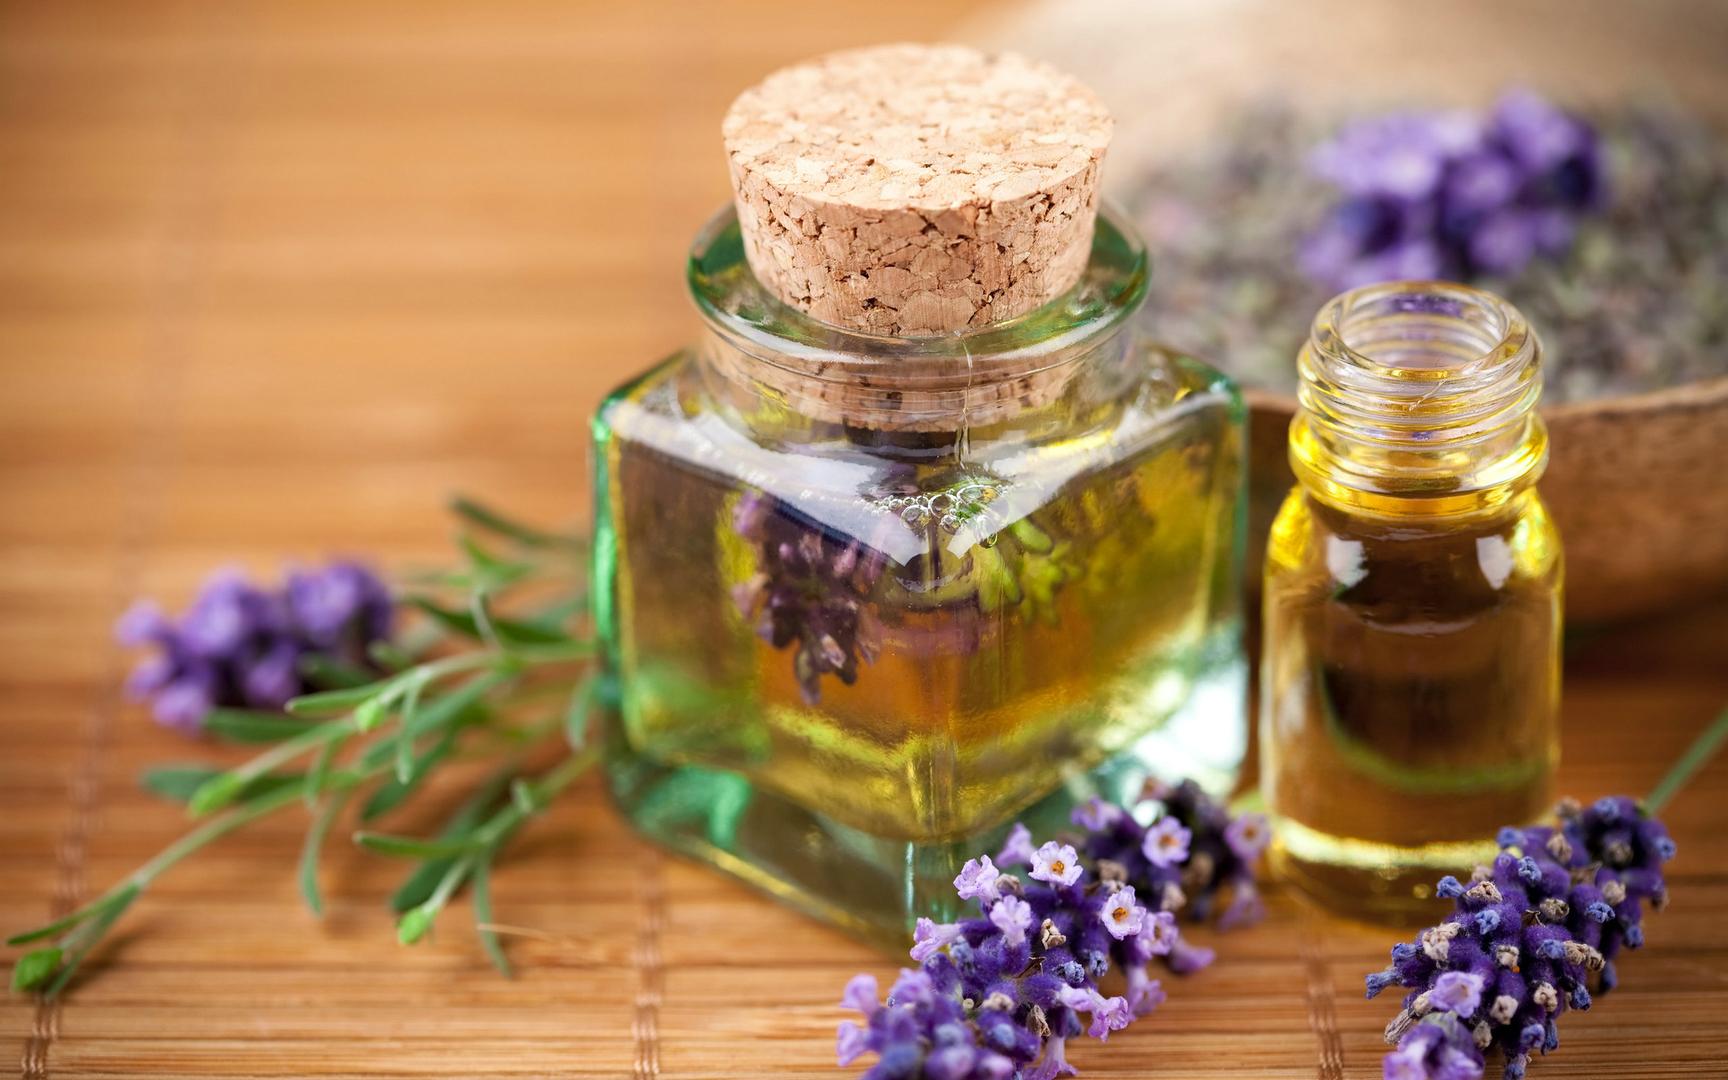 5 Manfaat Minyak Lavender Untuk Kulit Anda | MaryJardin.co